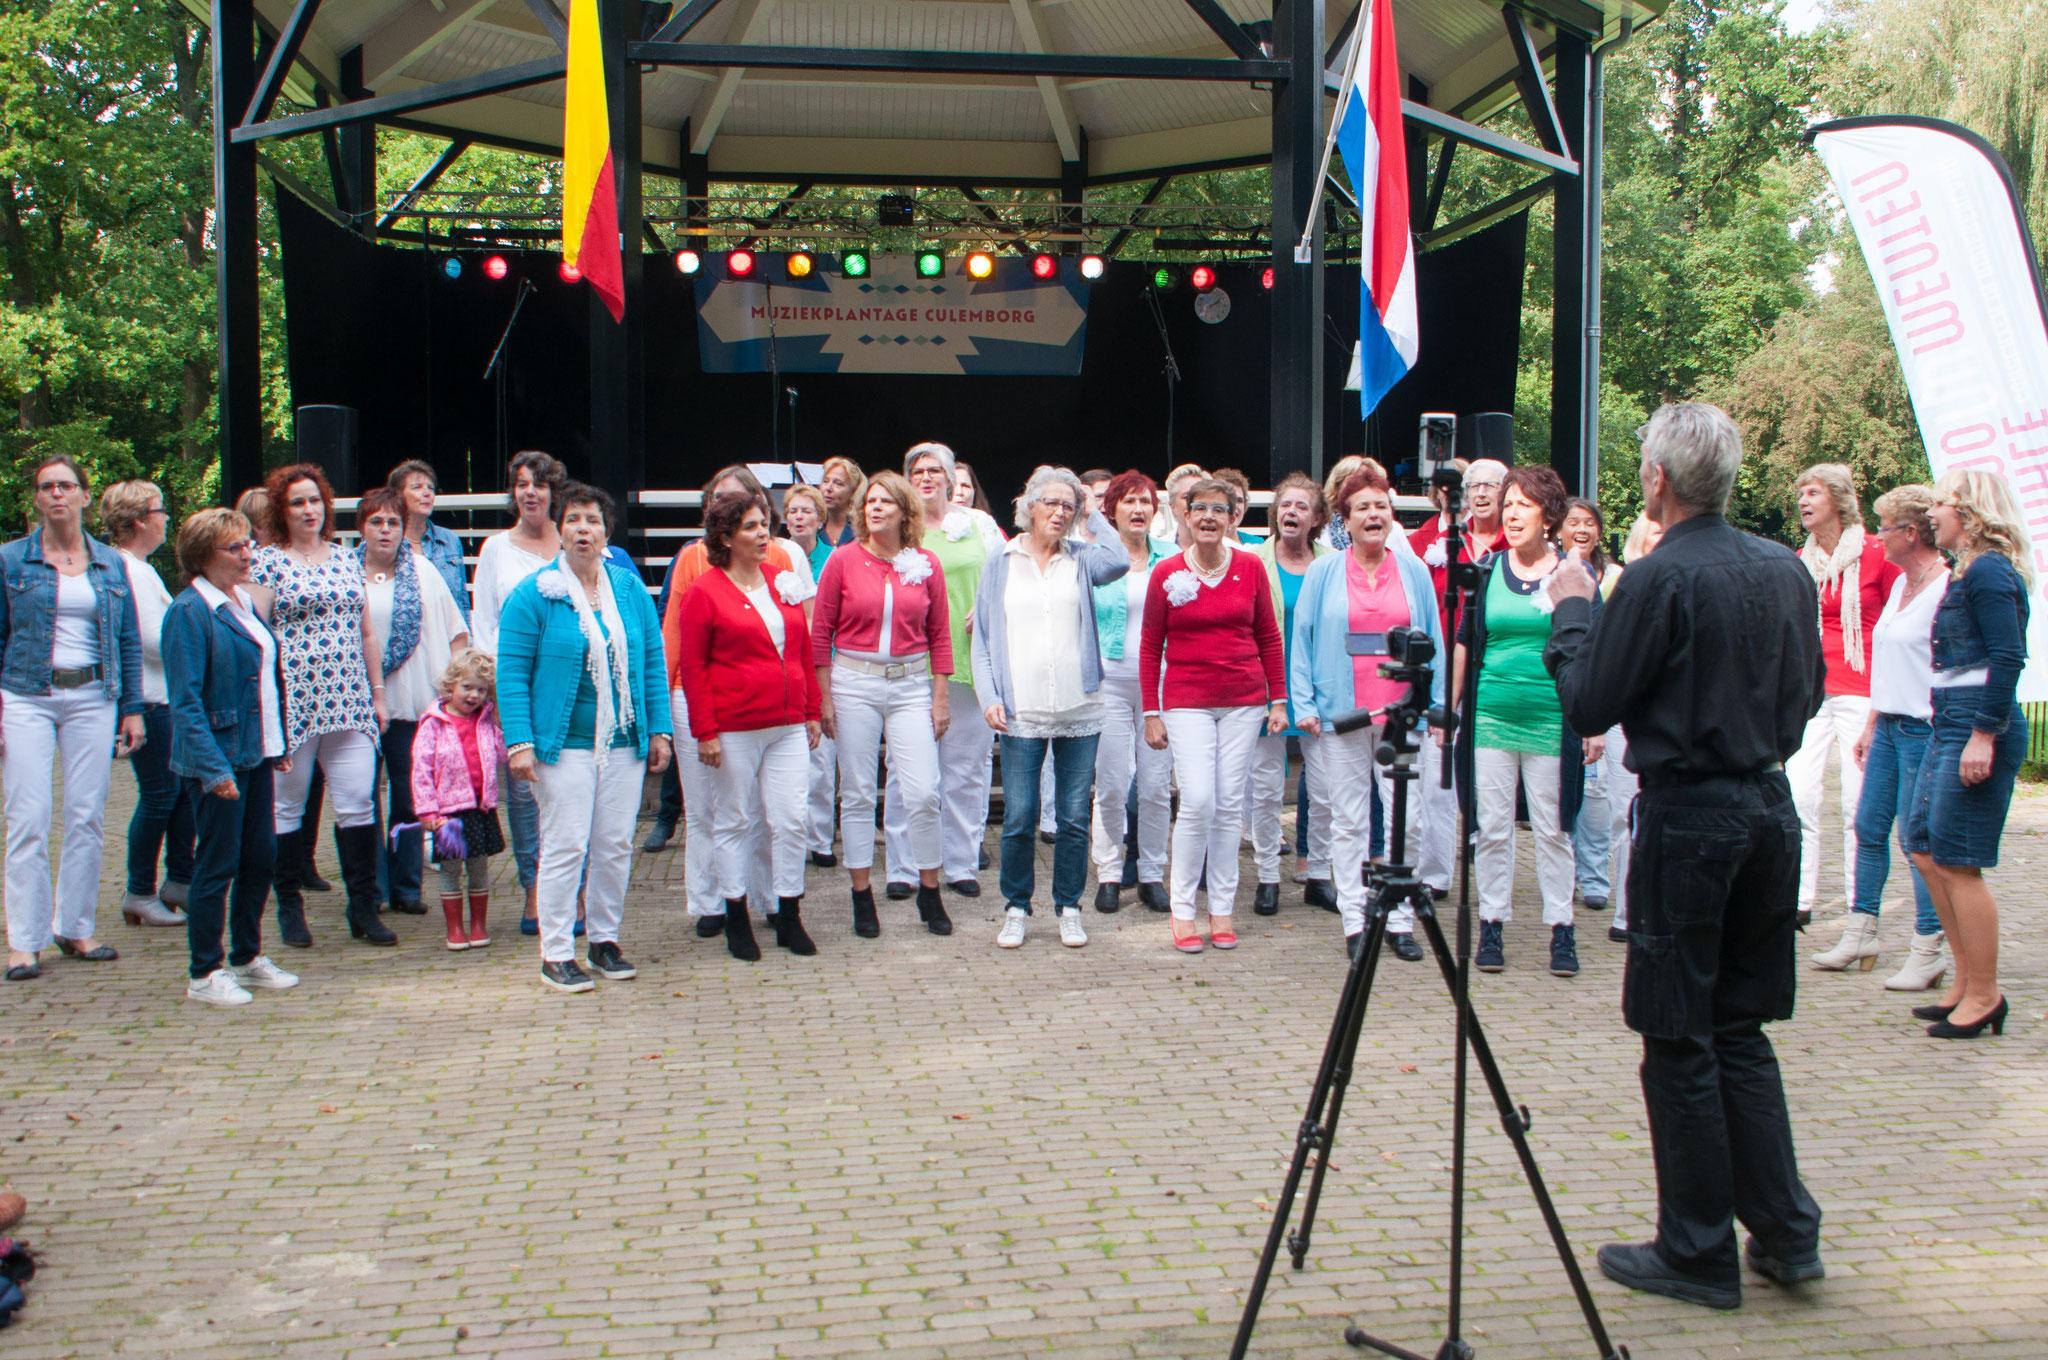 Muziektent de Plantage, Culemborg. 17 september 2017 (samen met Popkoor Nevermind)